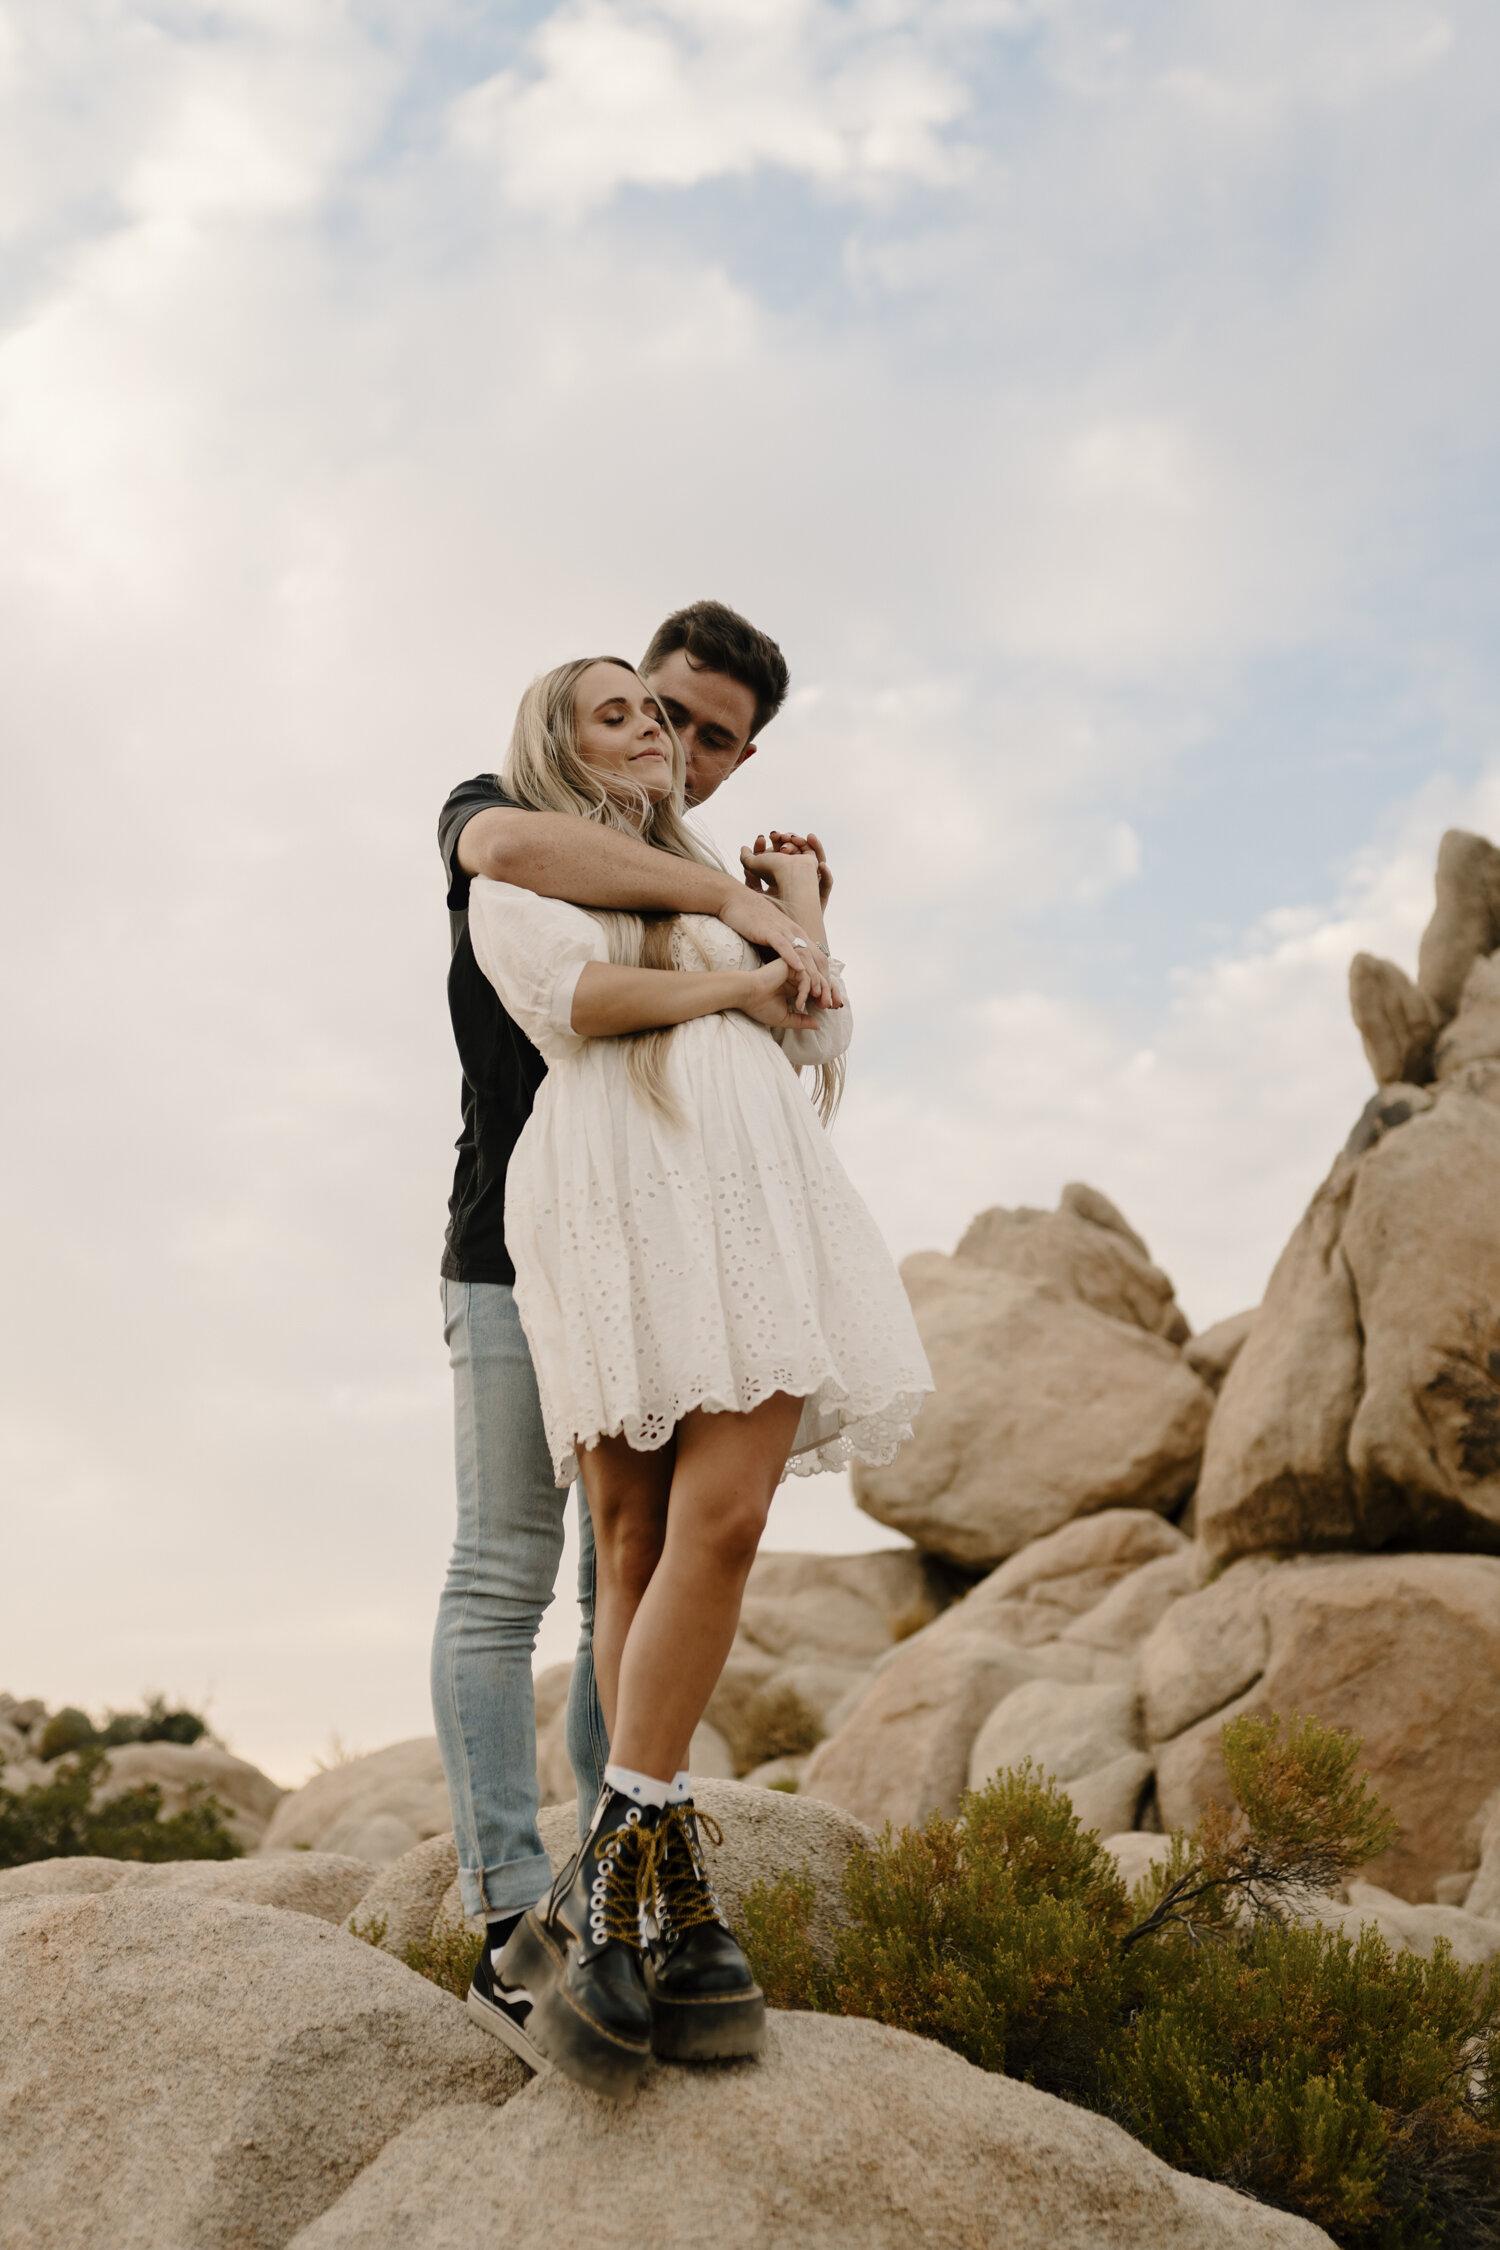 Joshua Tree, California Intimate Engagement Session by Kayli LaFon Photography    travel wedding & elopement photographer